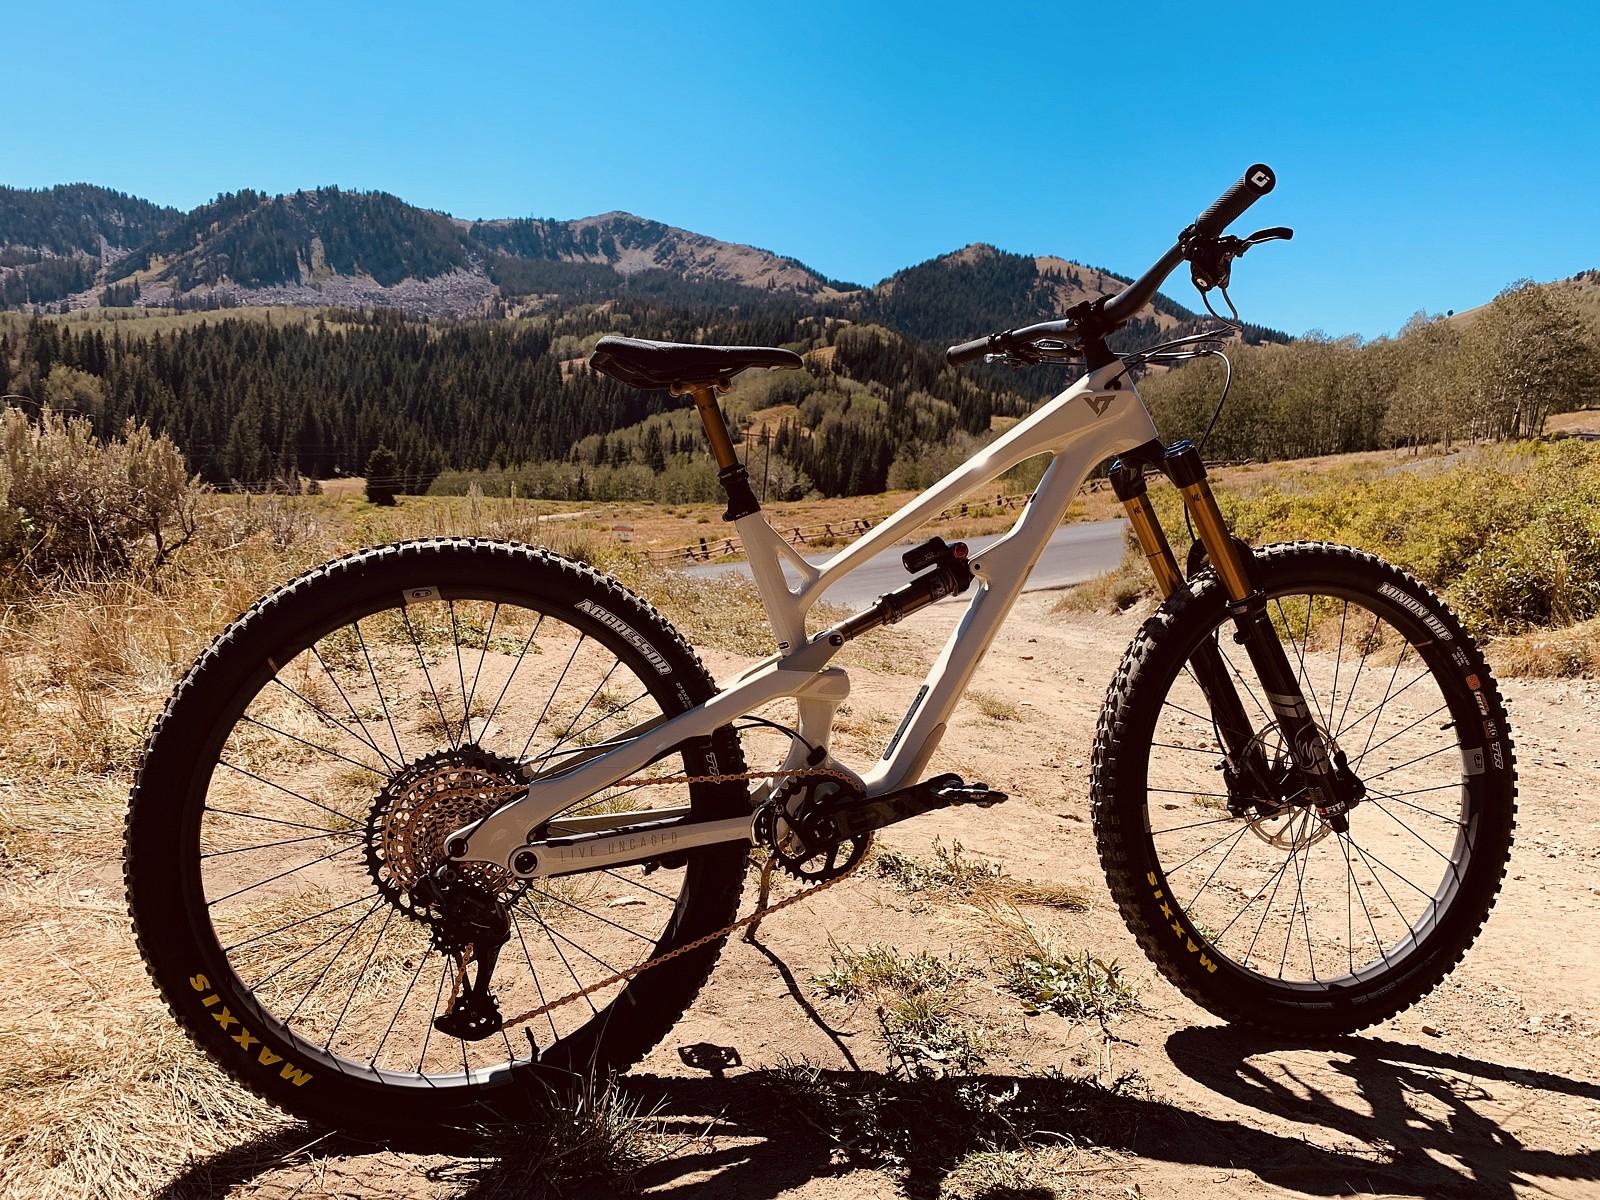 IMG E0204 - jaykalafatis - Mountain Biking Pictures - Vital MTB